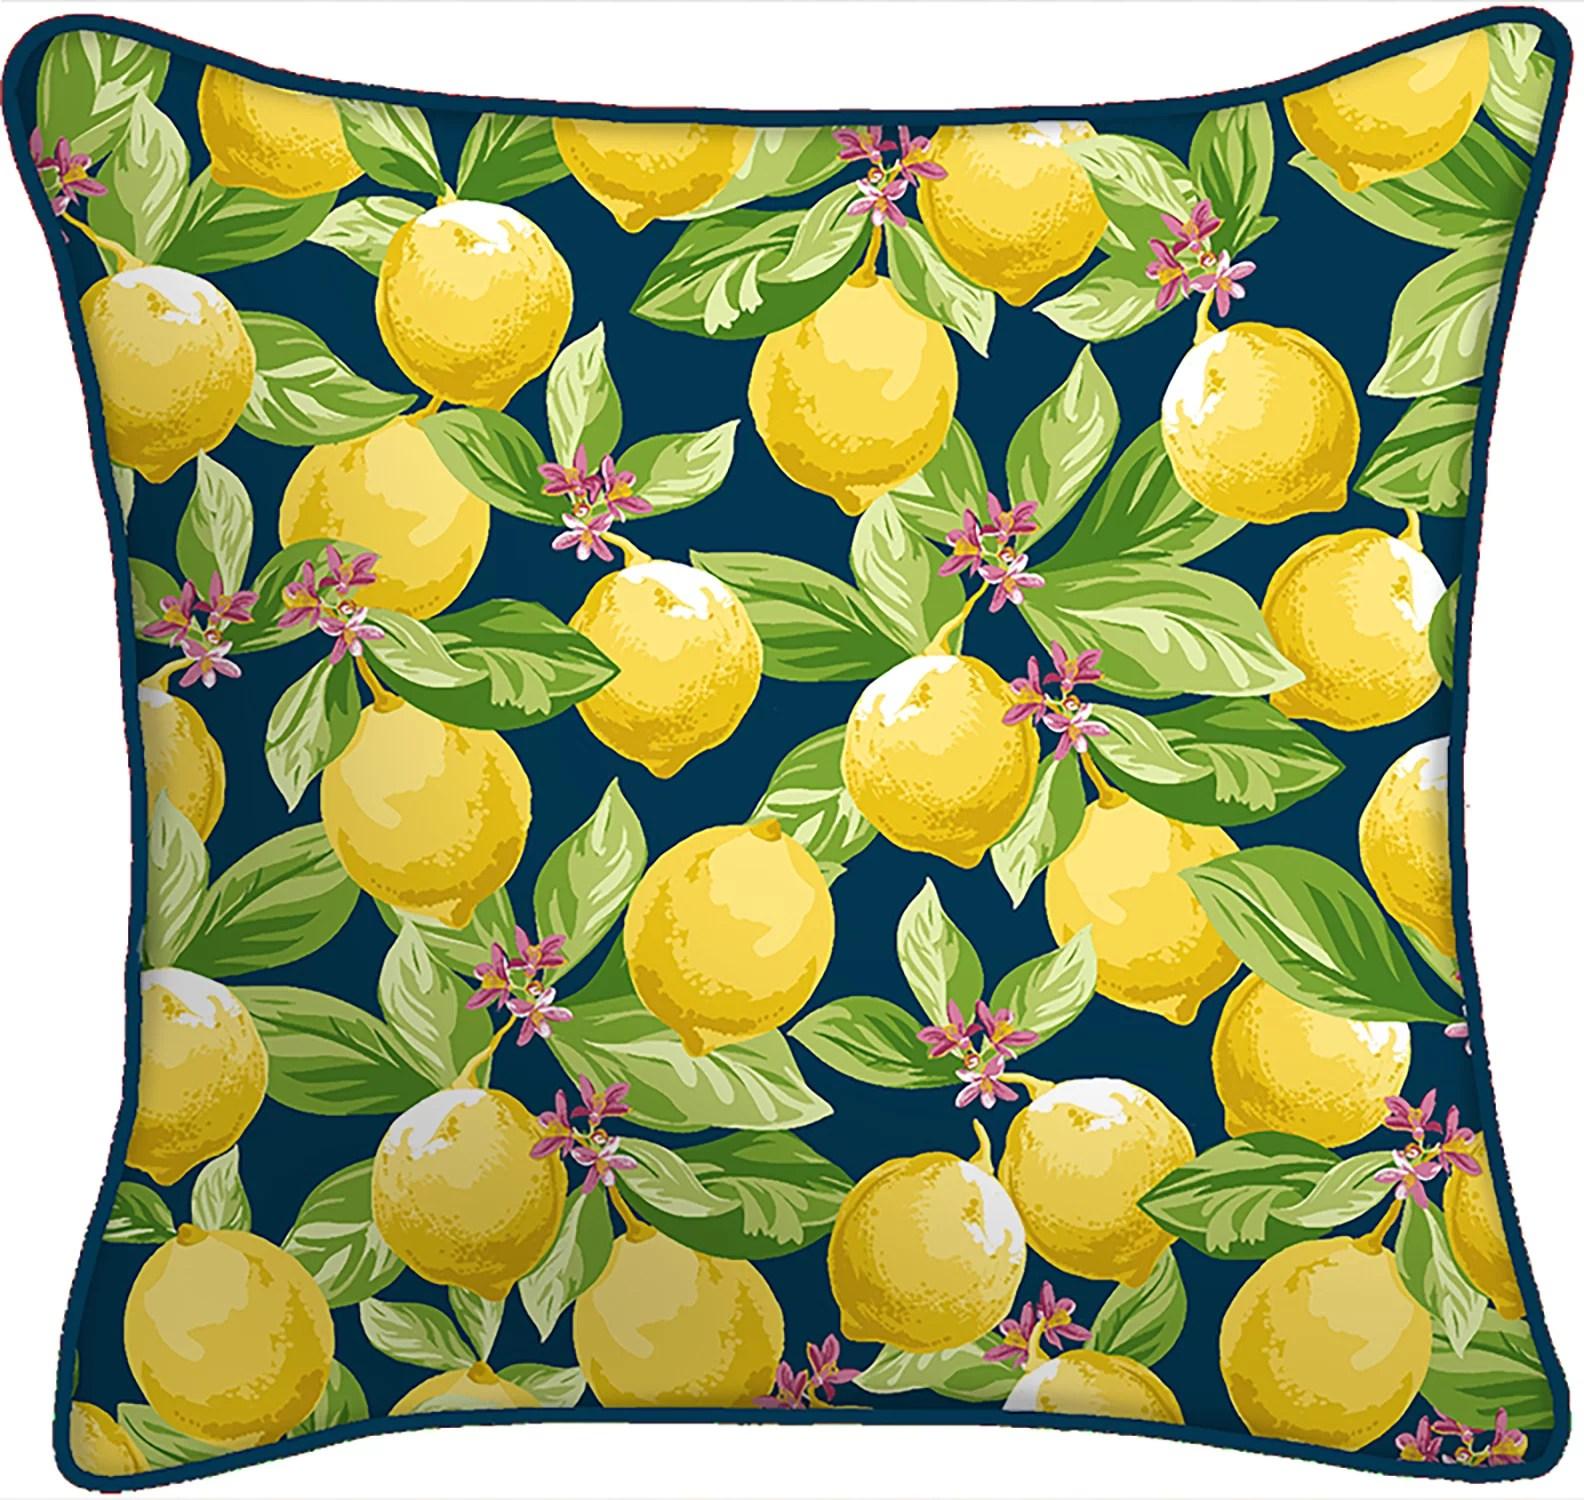 mainstays lemon outdoor pillow